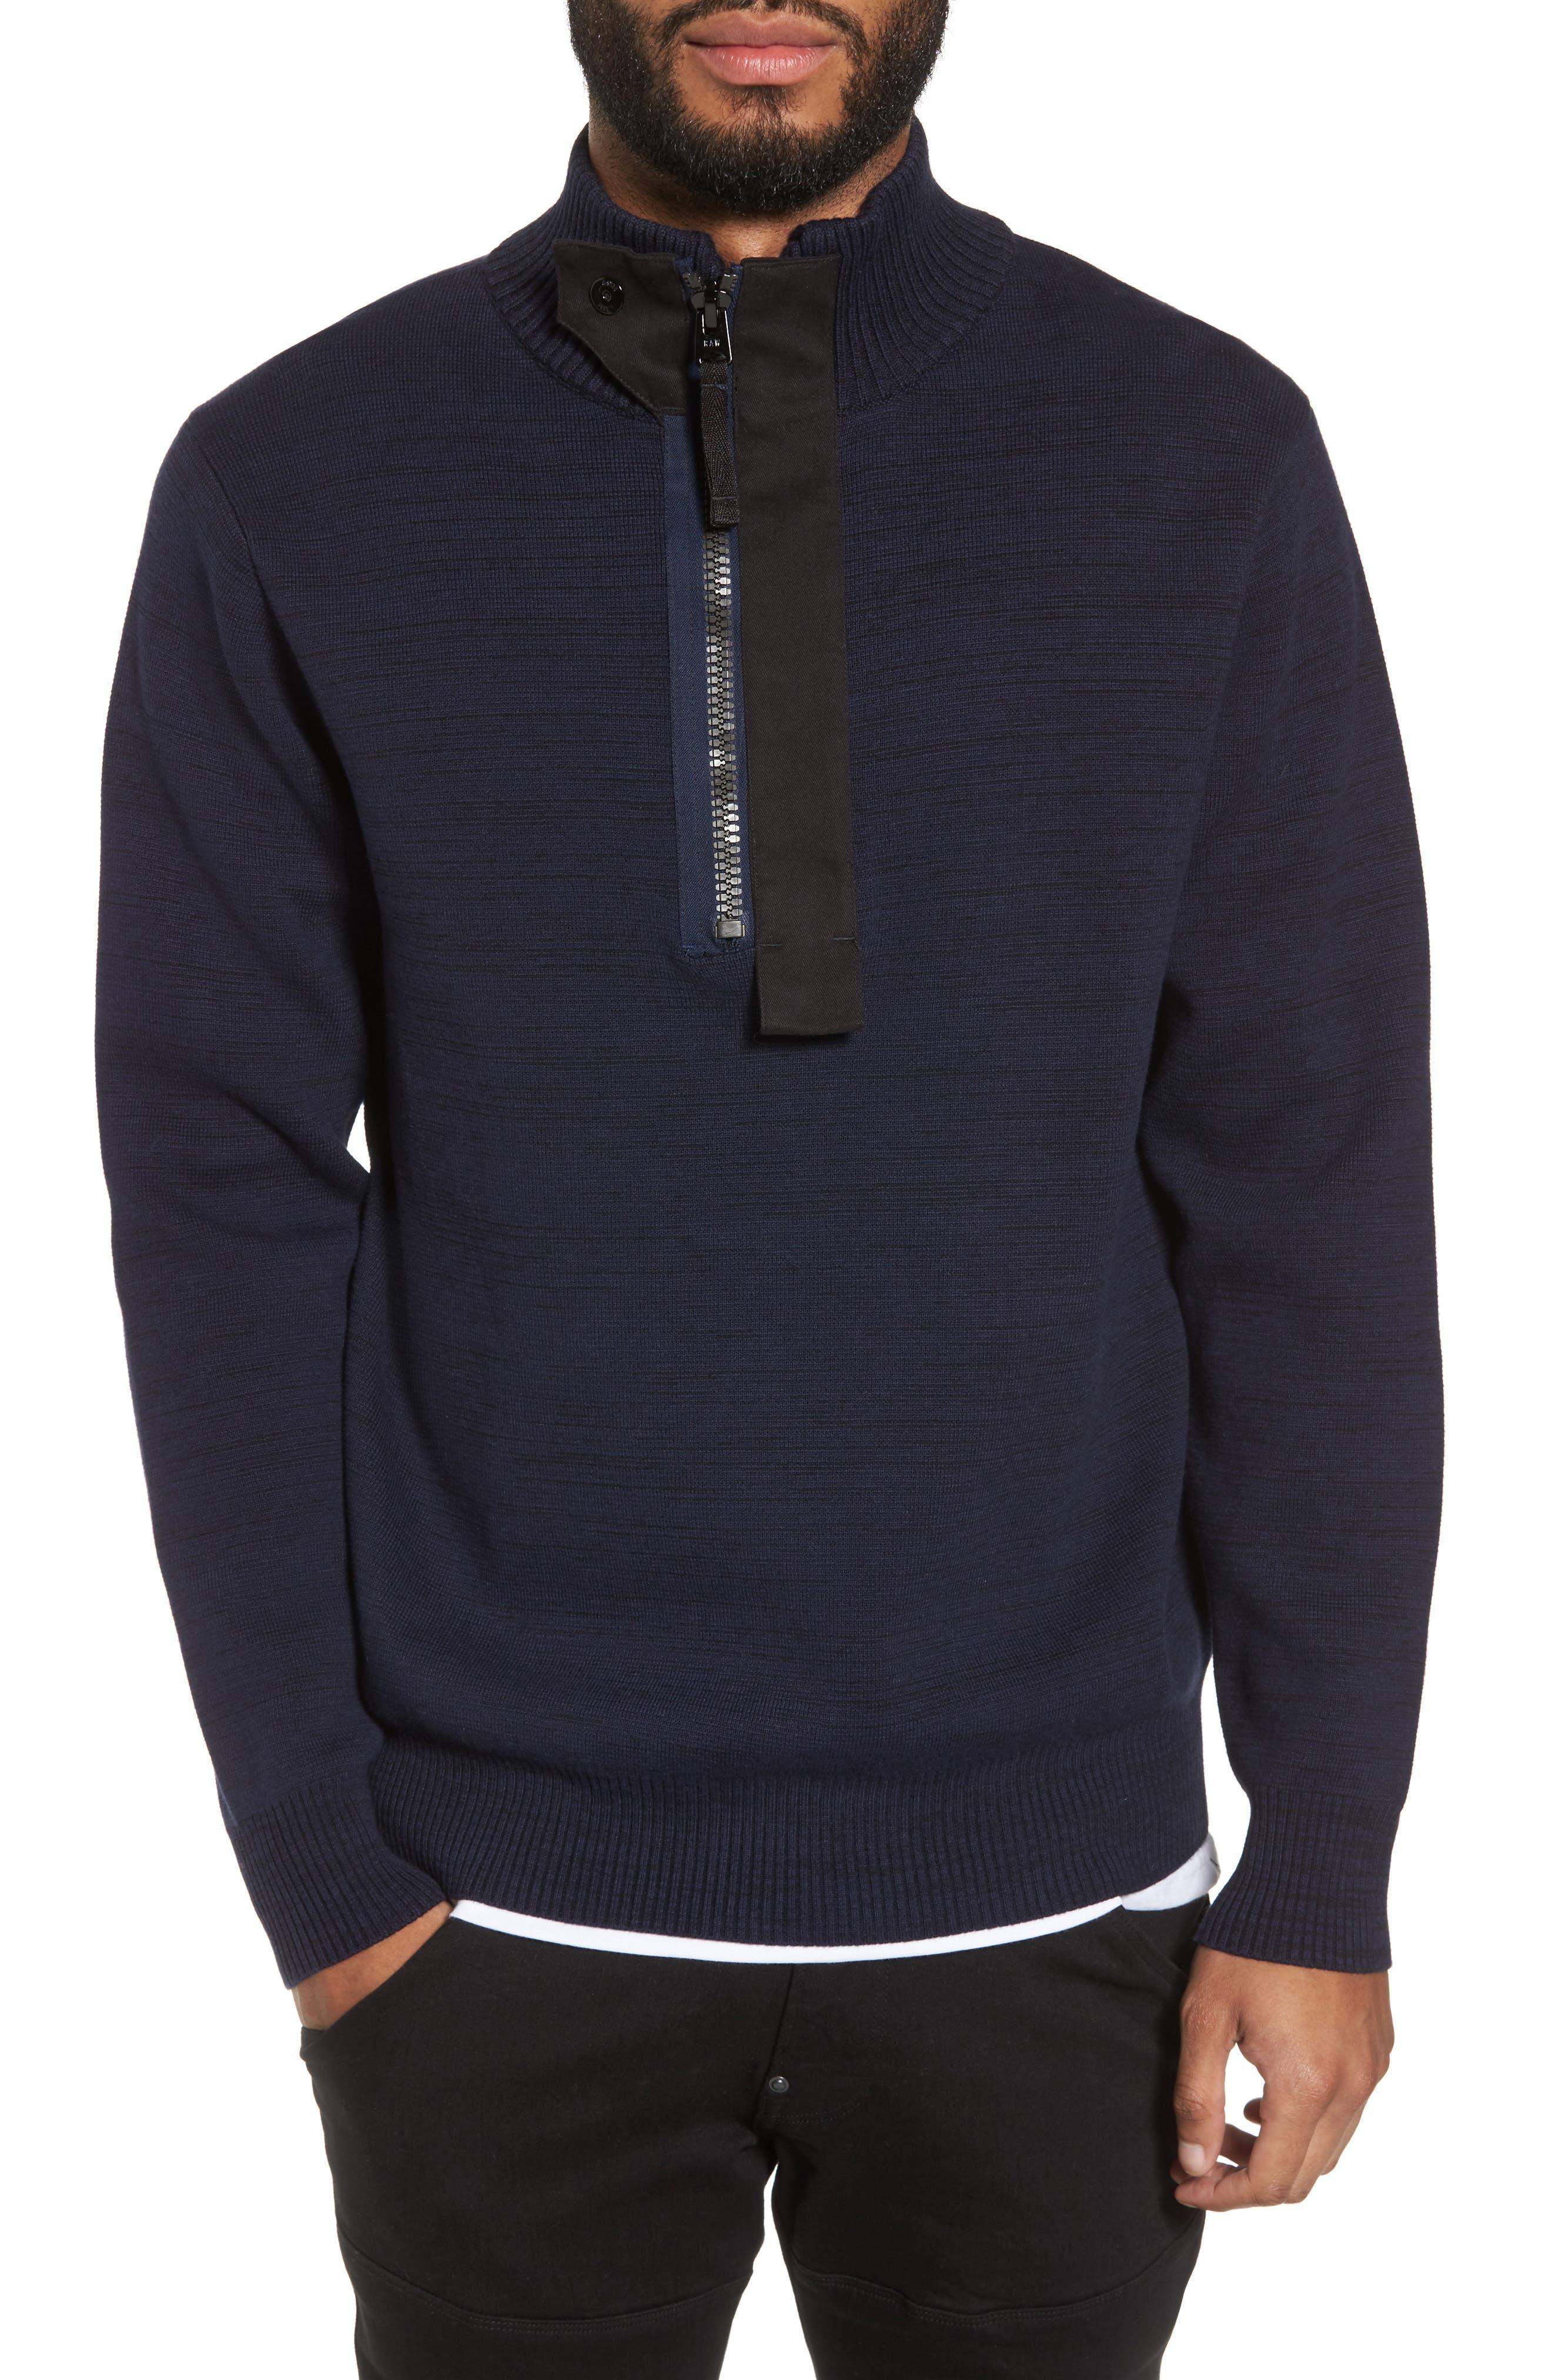 Empral Half-Zip Sweater,                             Main thumbnail 1, color,                             Blue/ Dark Black